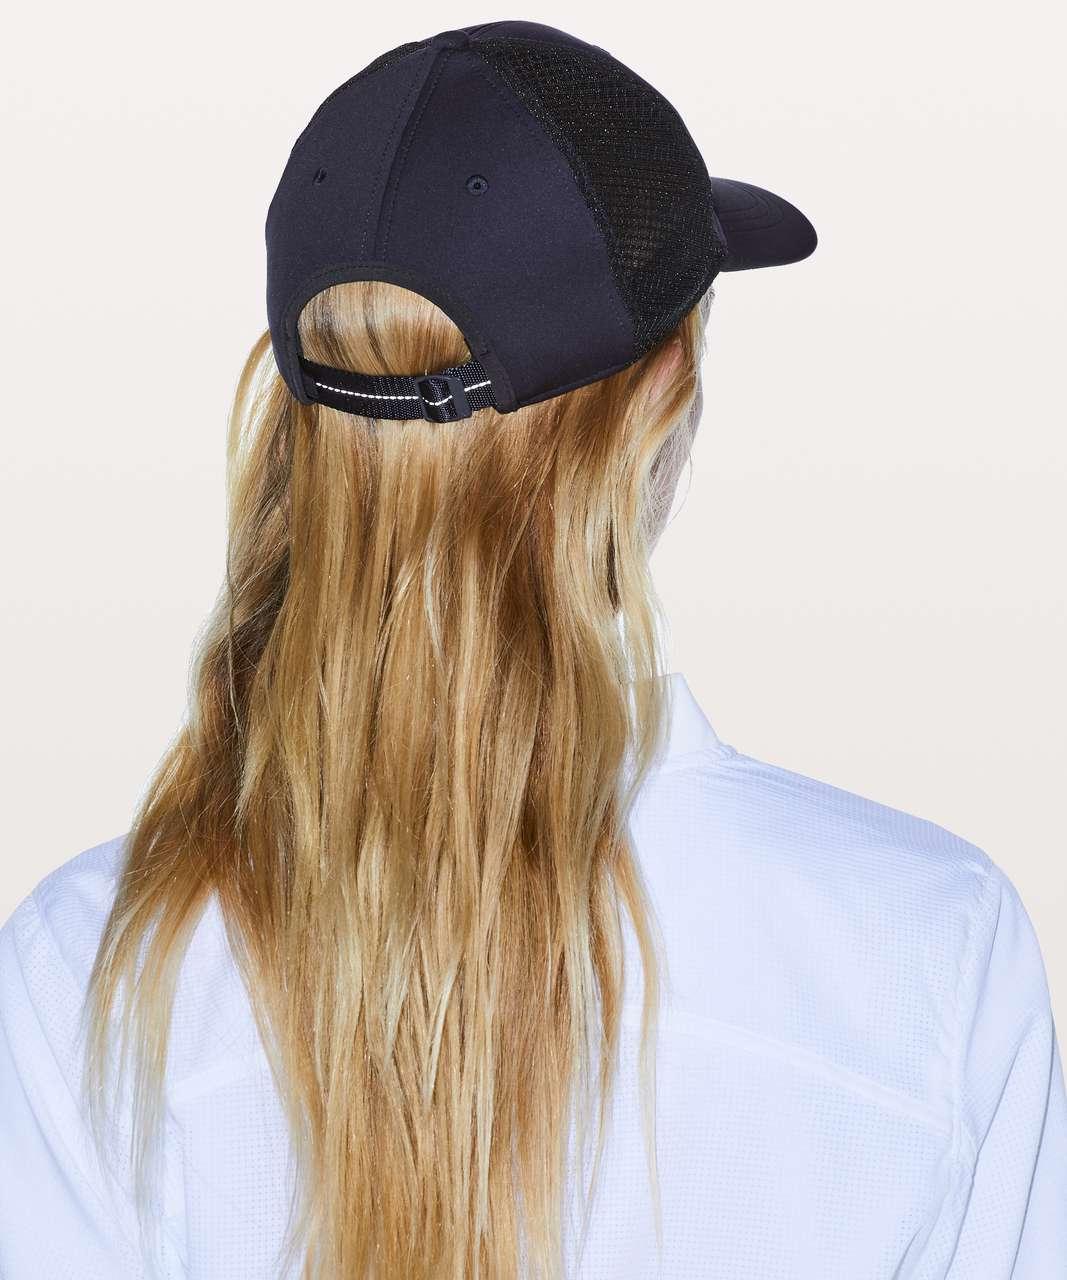 Lululemon Baller Hat *Meshed Up - Midnight Navy / Black